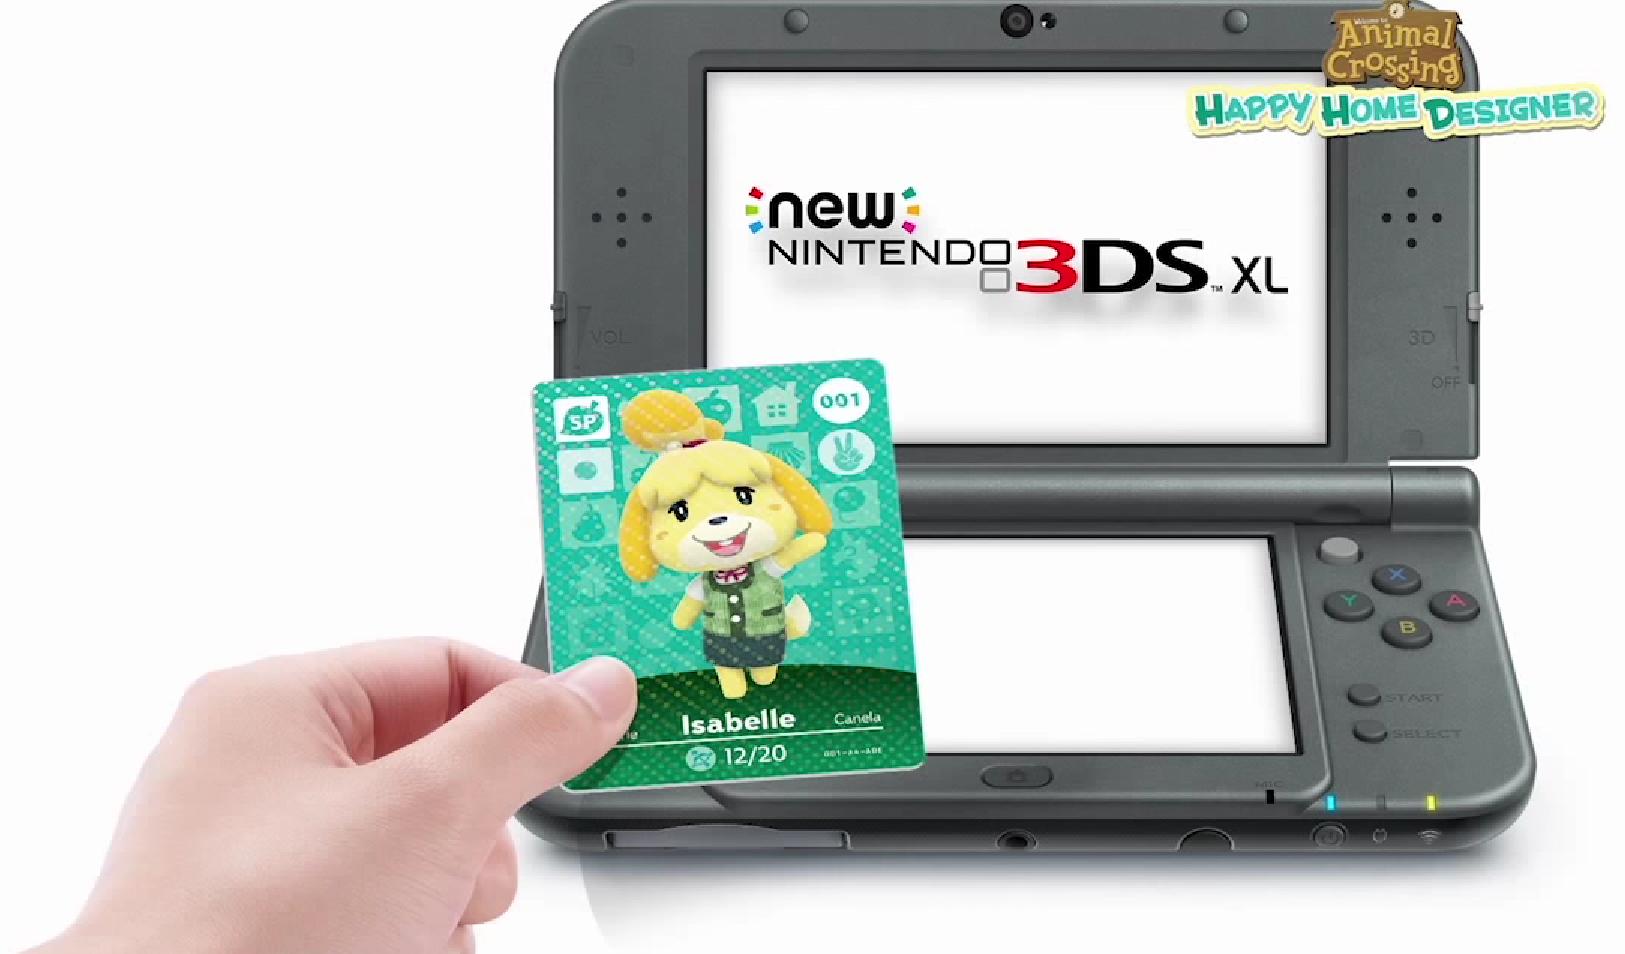 Animal Crossing Happy Home Designer Card amiibo